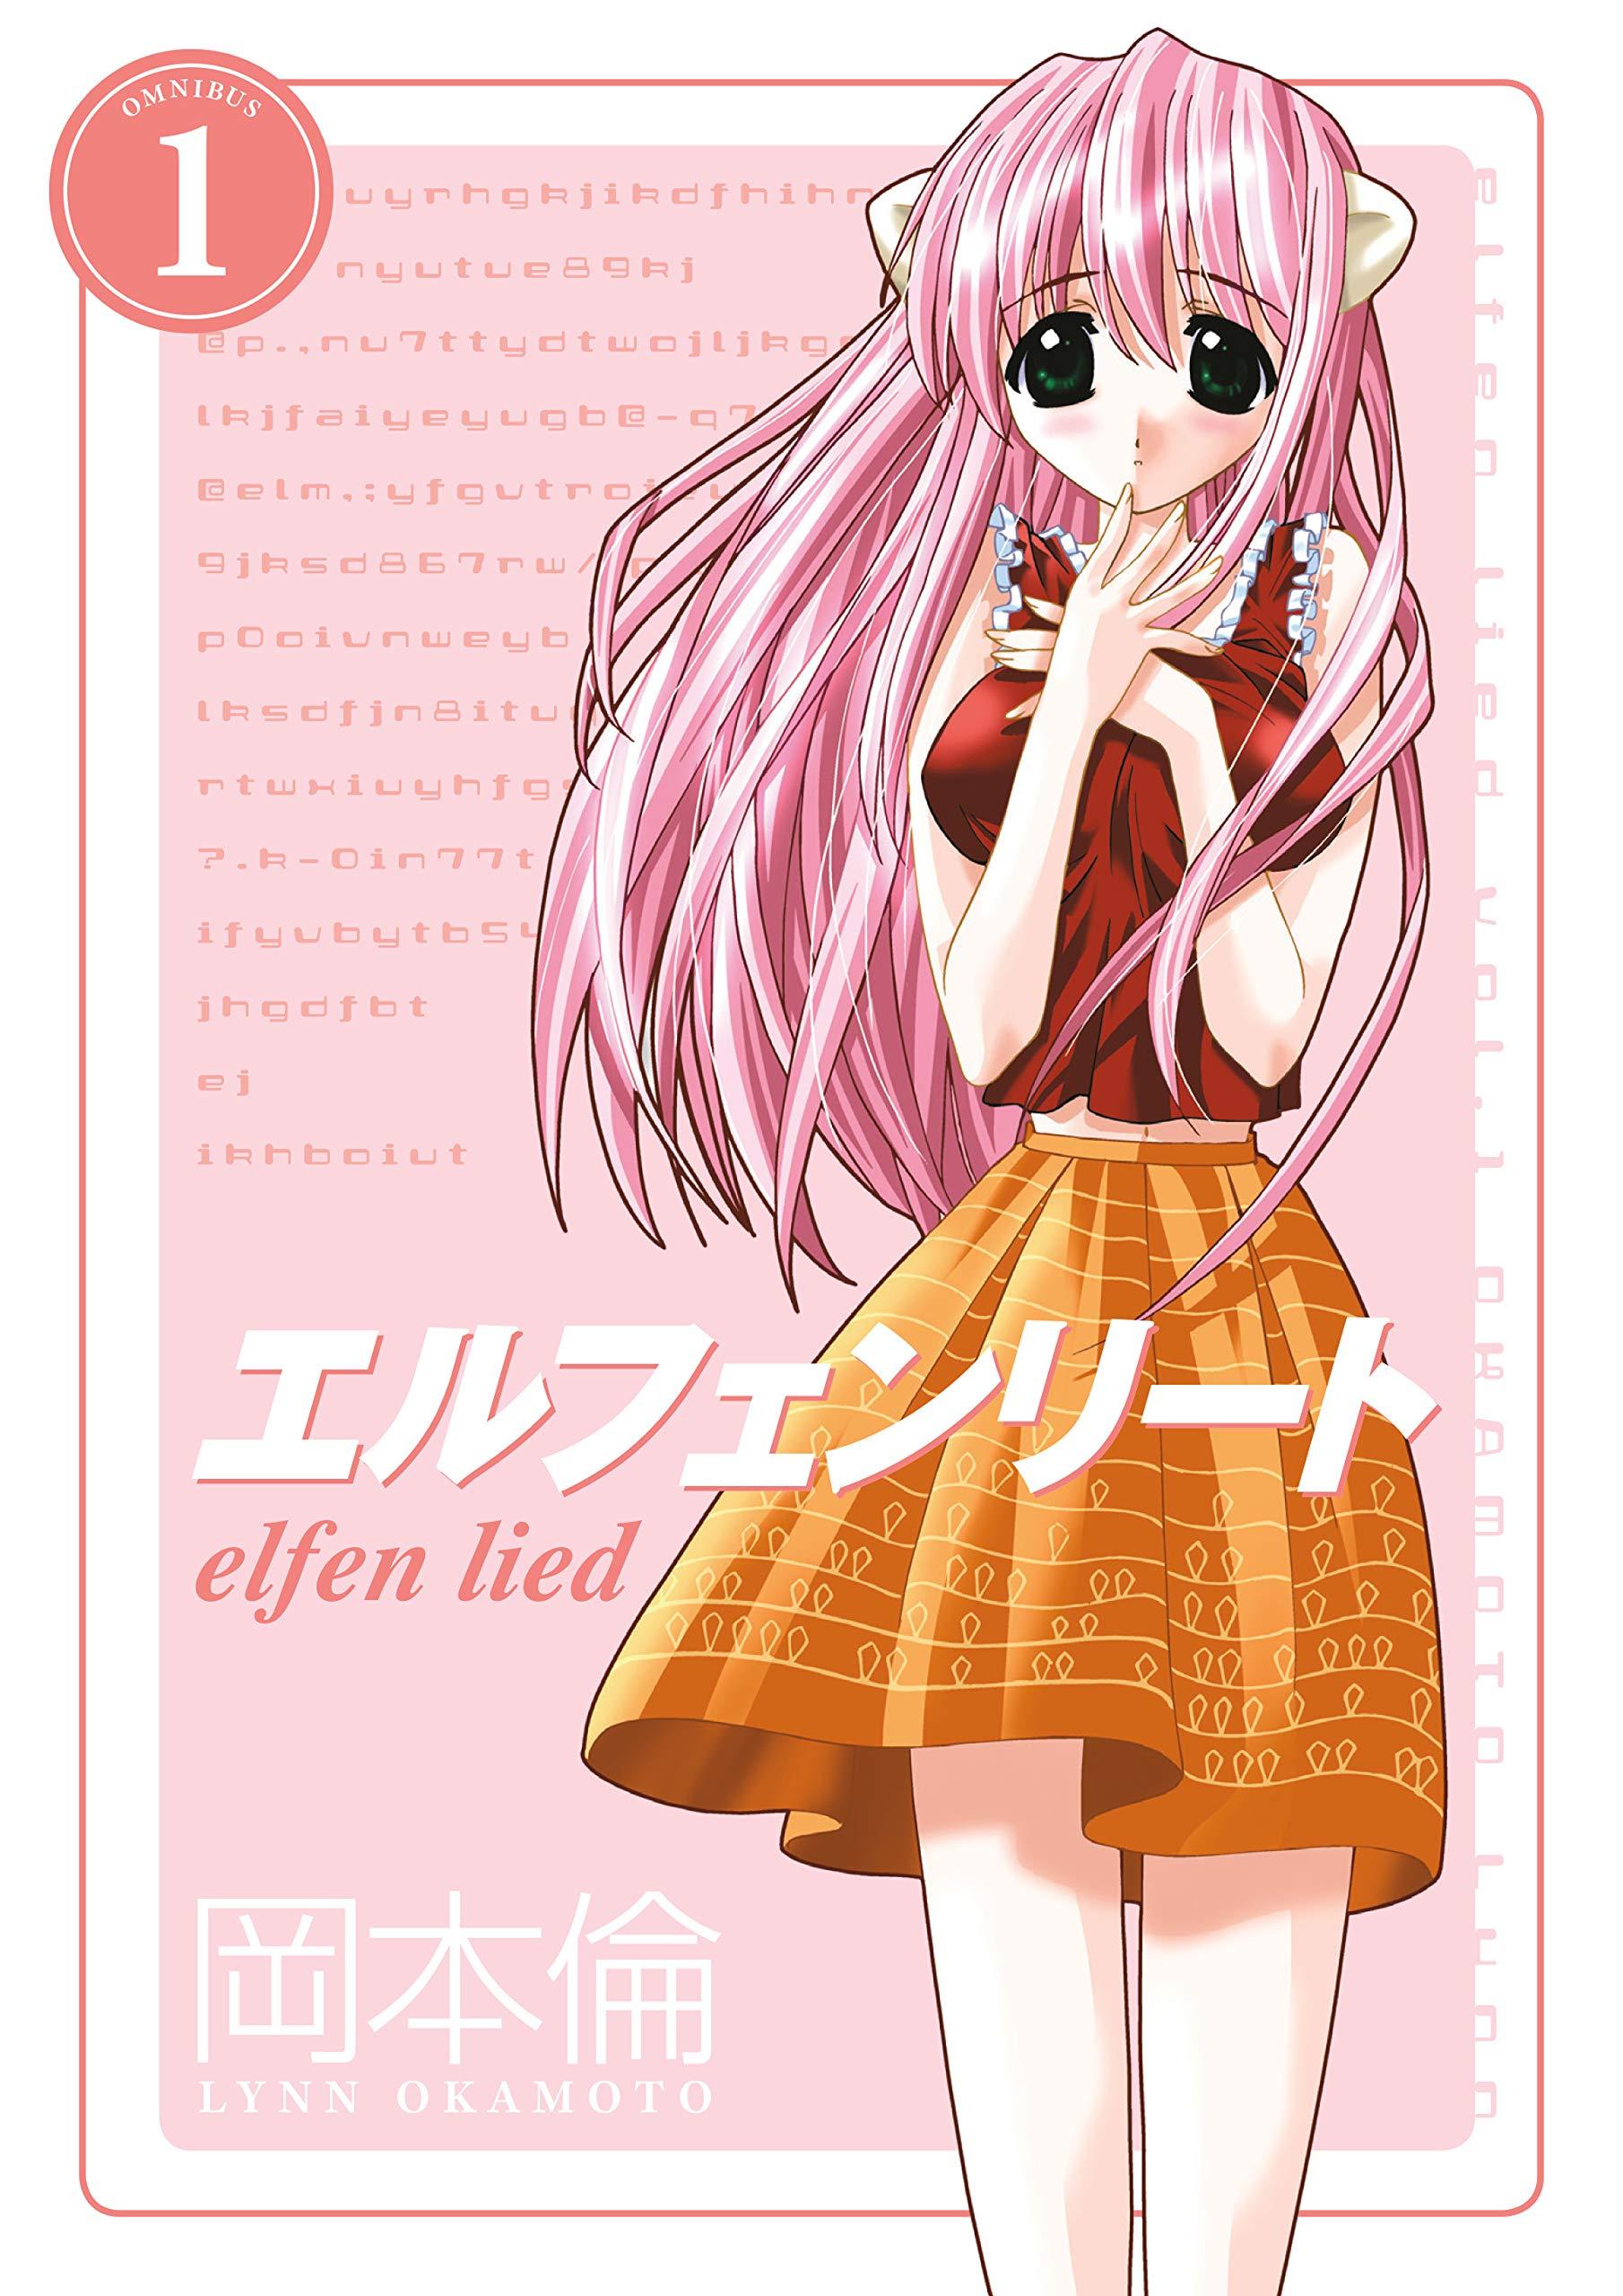 Elfen Lied Omnibus Volume 1: Lynn Okamoto: 9781506711737